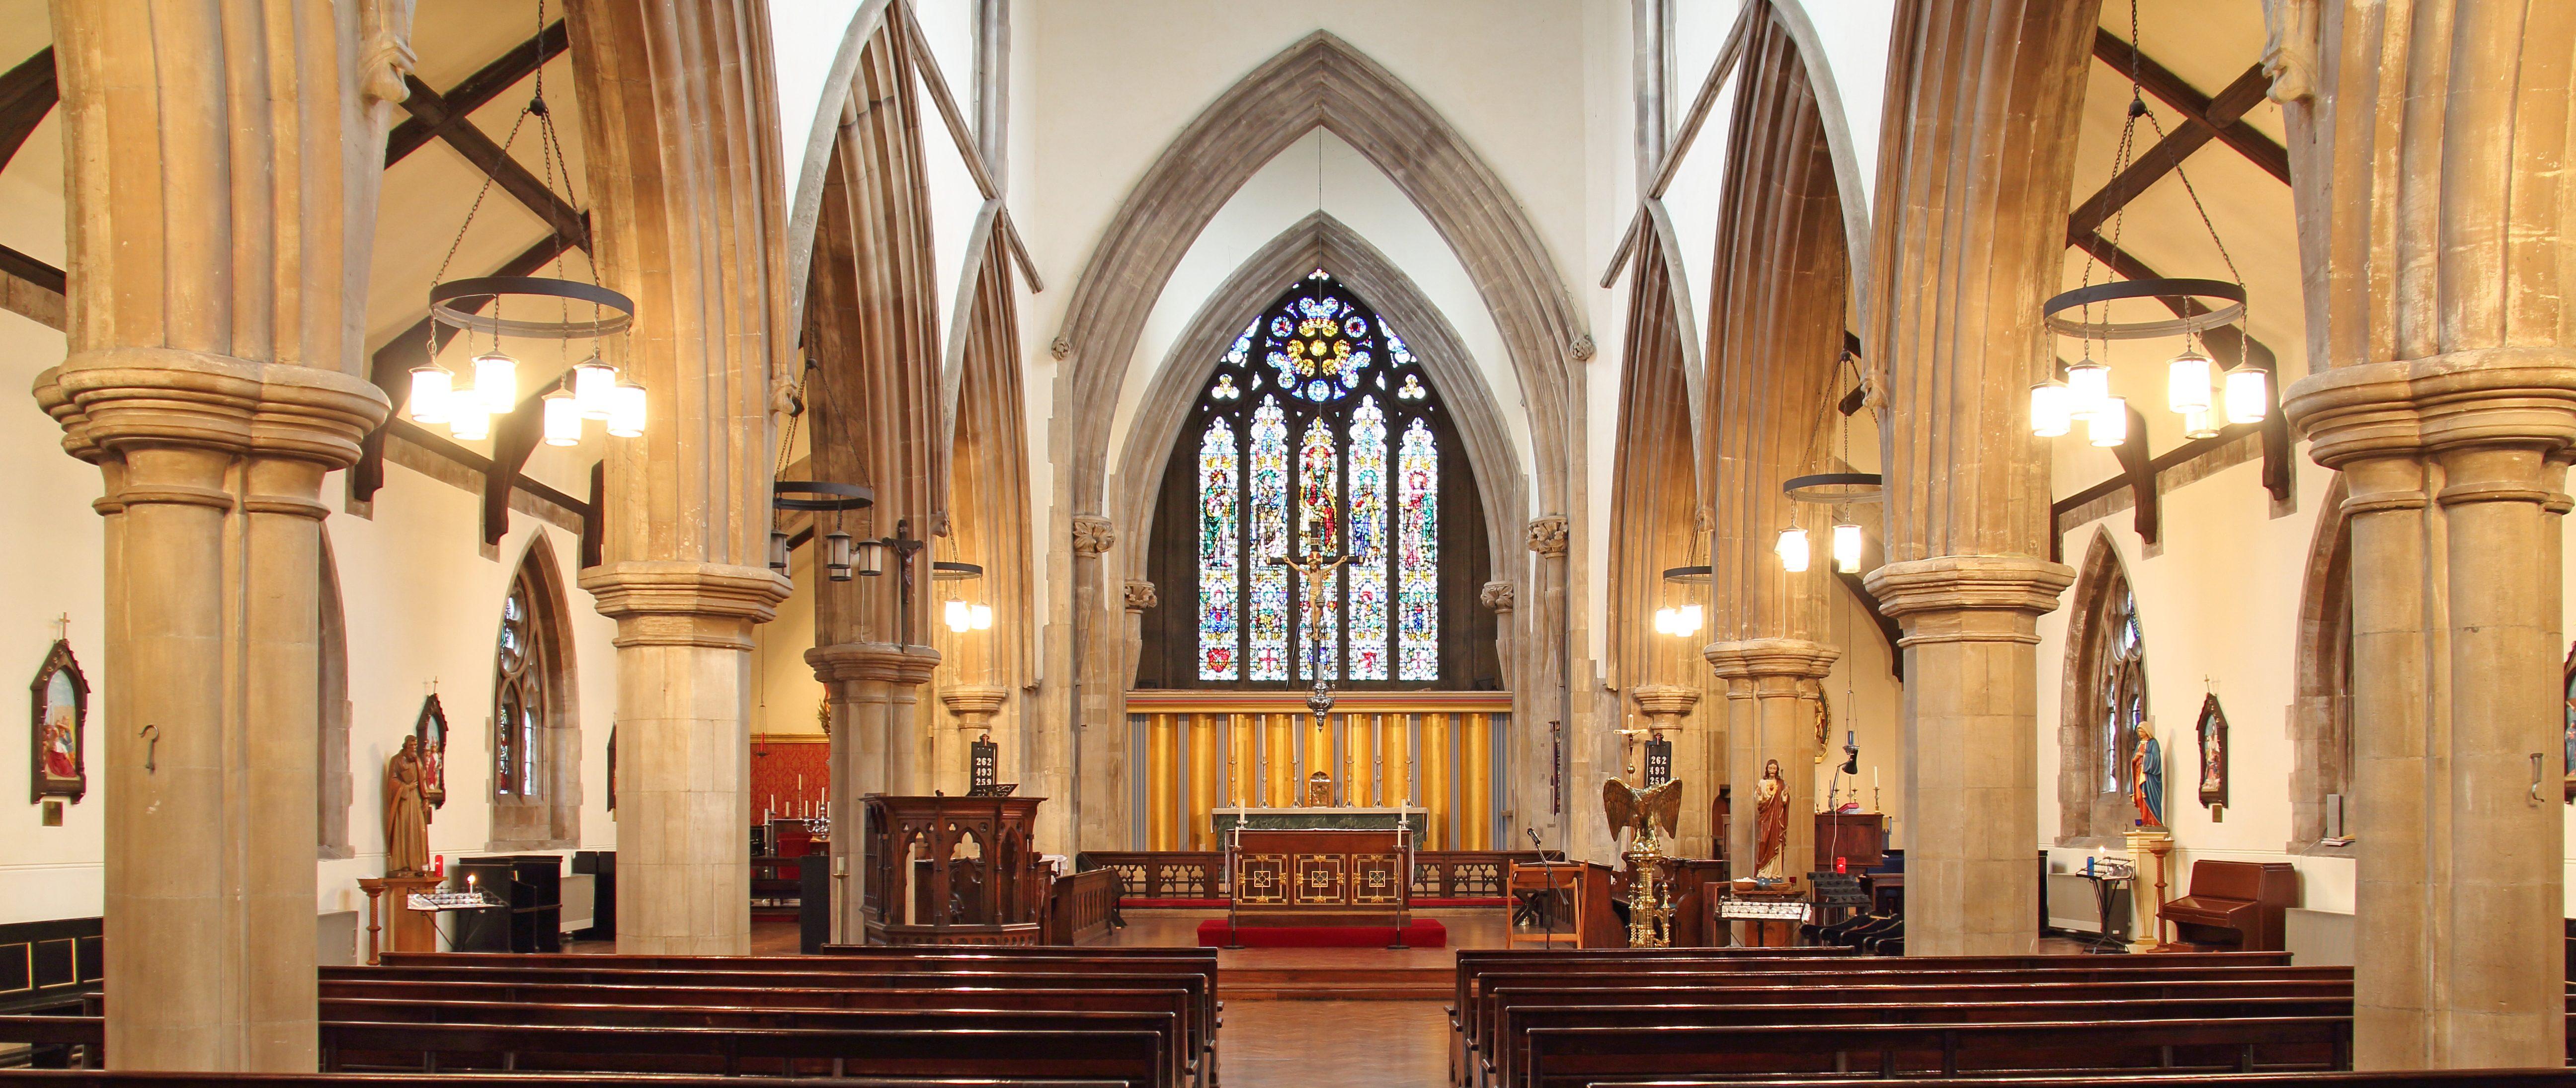 Christ in Stoke Newington N16